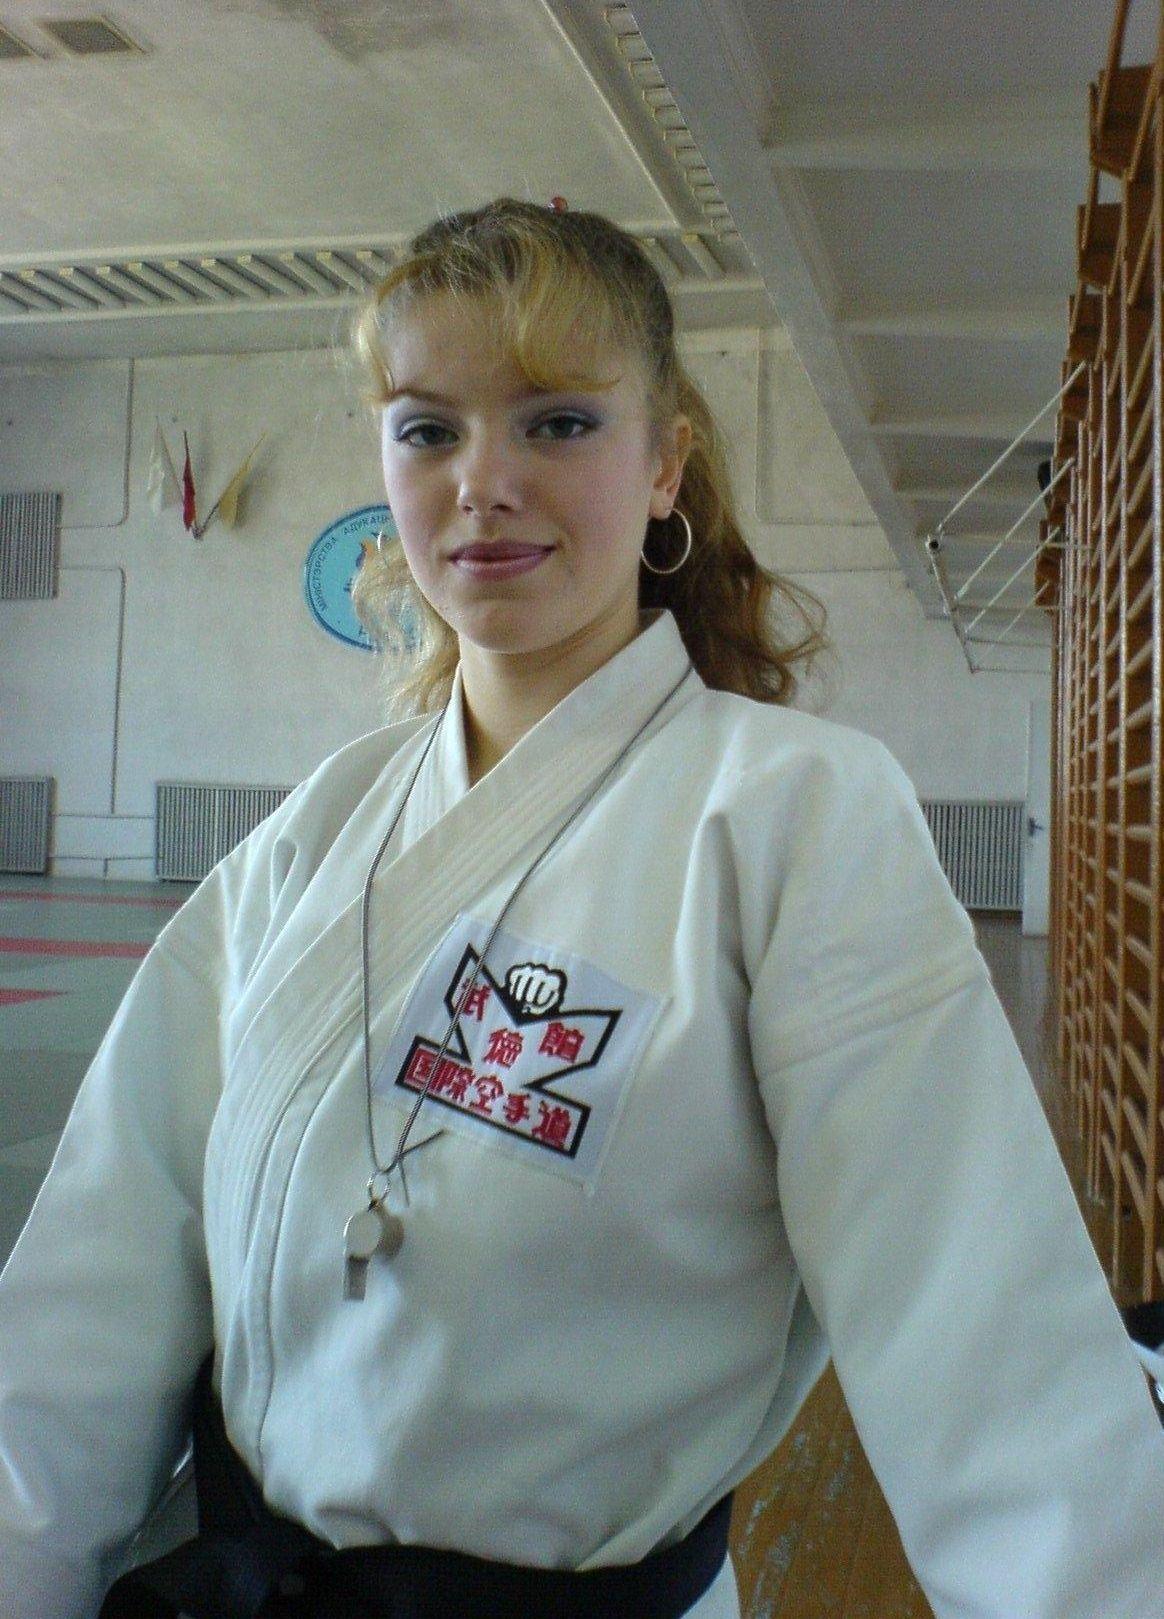 https://i2.wp.com/upload.wikimedia.org/wikipedia/commons/1/17/Liudmila_Andreevna_VEDERNIKOVA.jpg